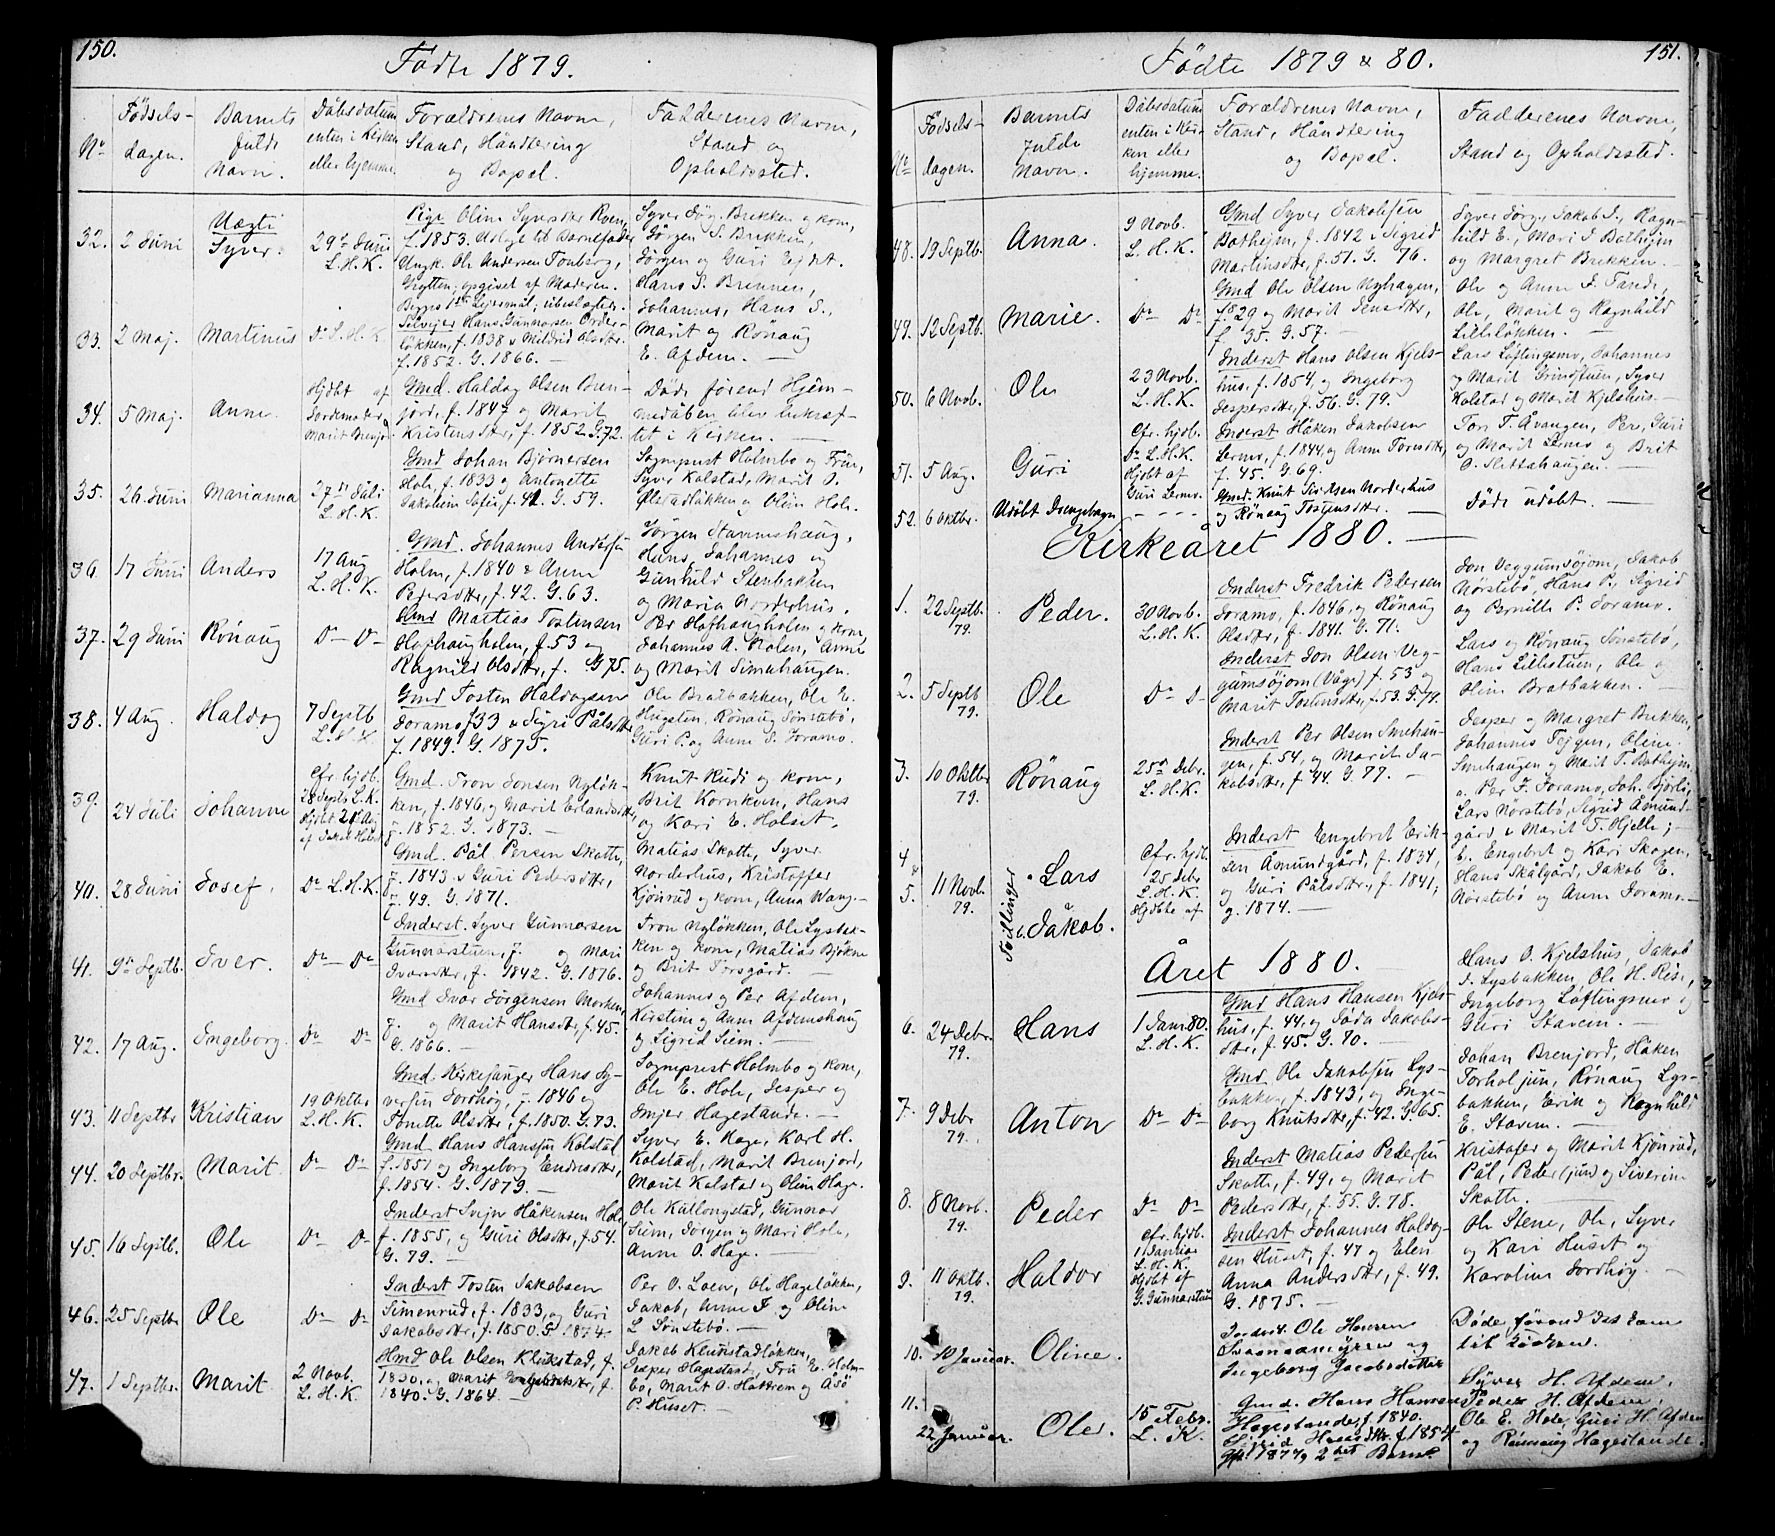 SAH, Lesja prestekontor, Klokkerbok nr. 5, 1850-1894, s. 150-151